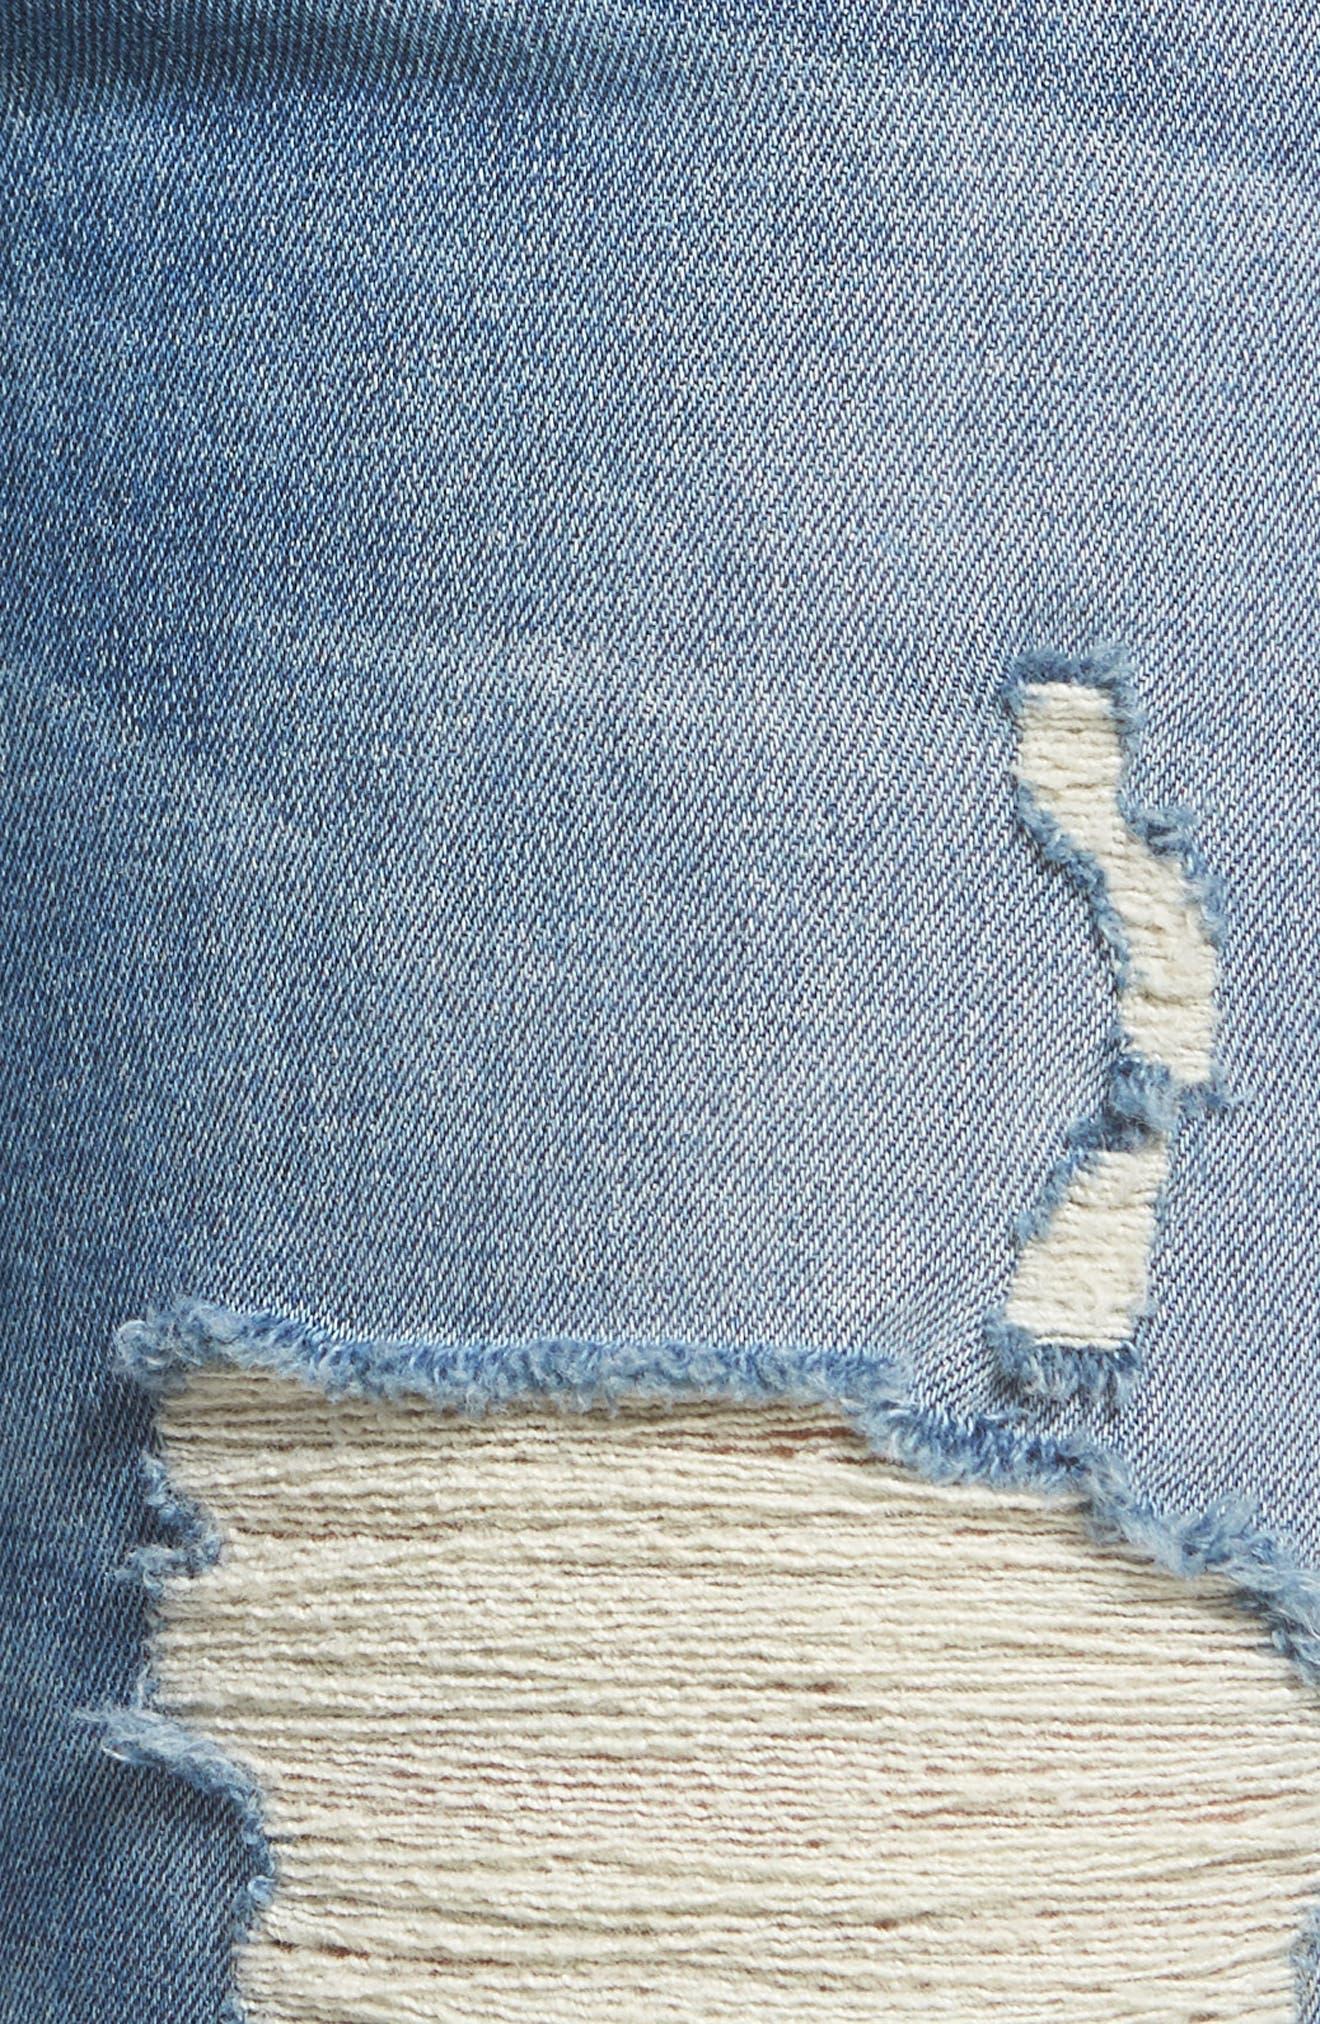 Zoeey High Waist Ankle Straight Leg Jeans,                             Alternate thumbnail 6, color,                             Kool